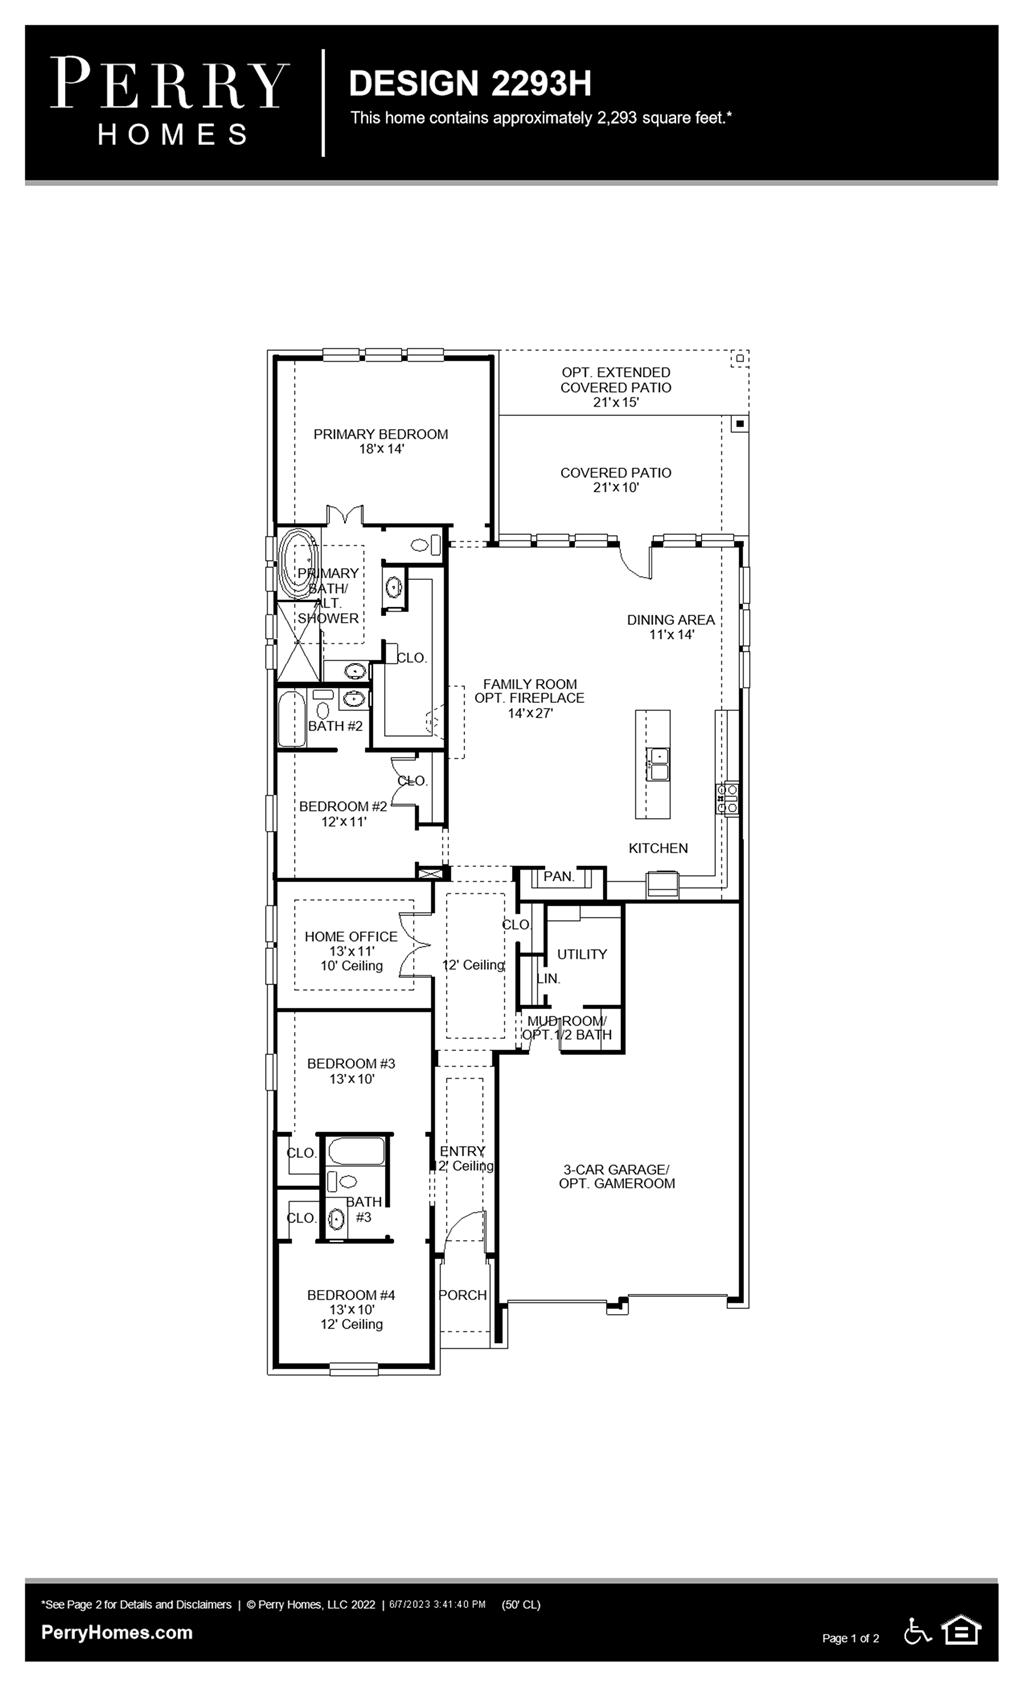 Floor Plan for 2293H